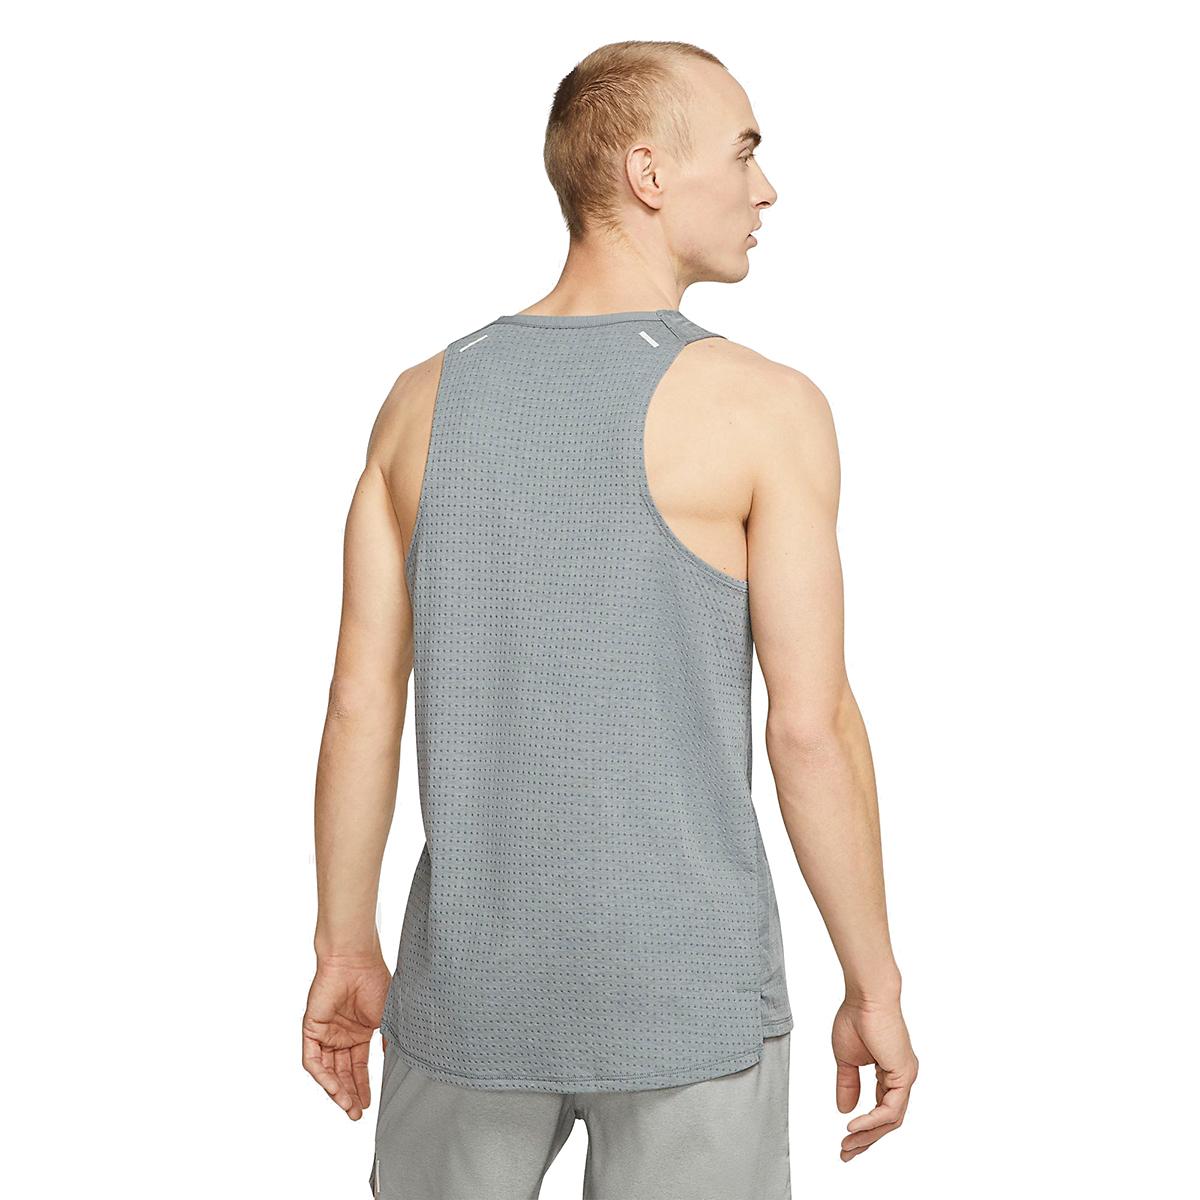 Men's Nike Rise 365 Running Tank - Color: Smoke Grey/Heather - Size: S, Smoke Grey/Heather, large, image 2